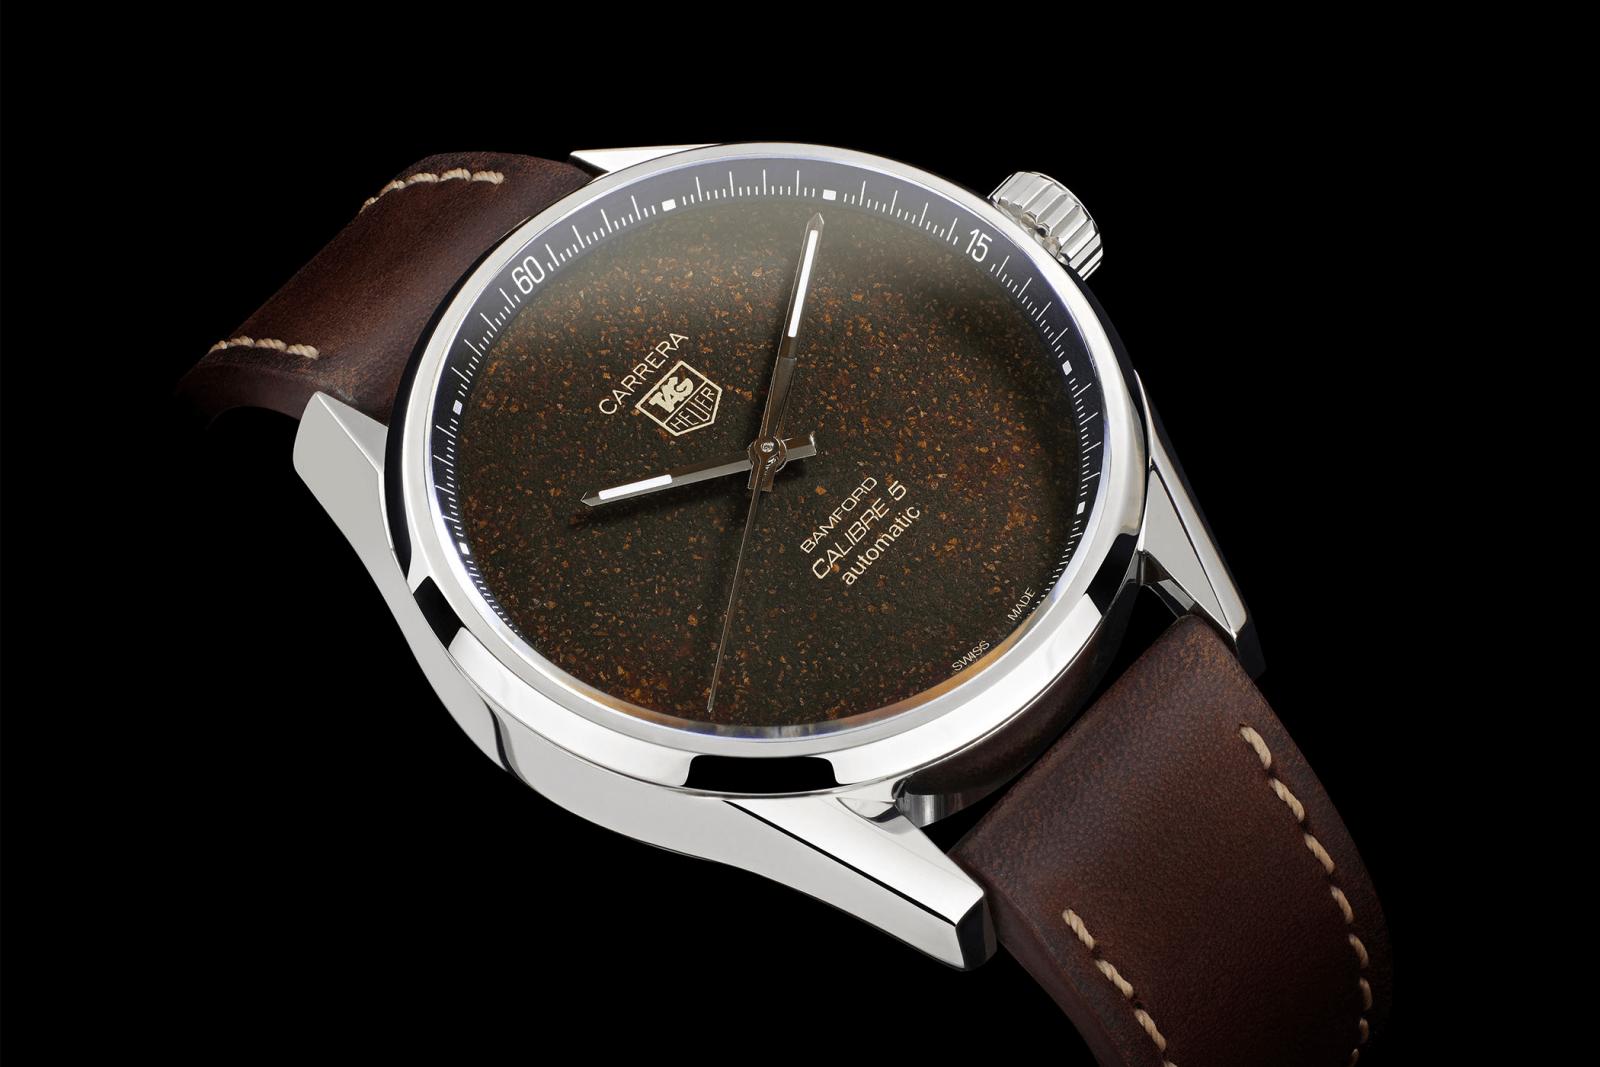 đồng hồ mặt số màu cafe tropical tag heuer carrera mới 2020